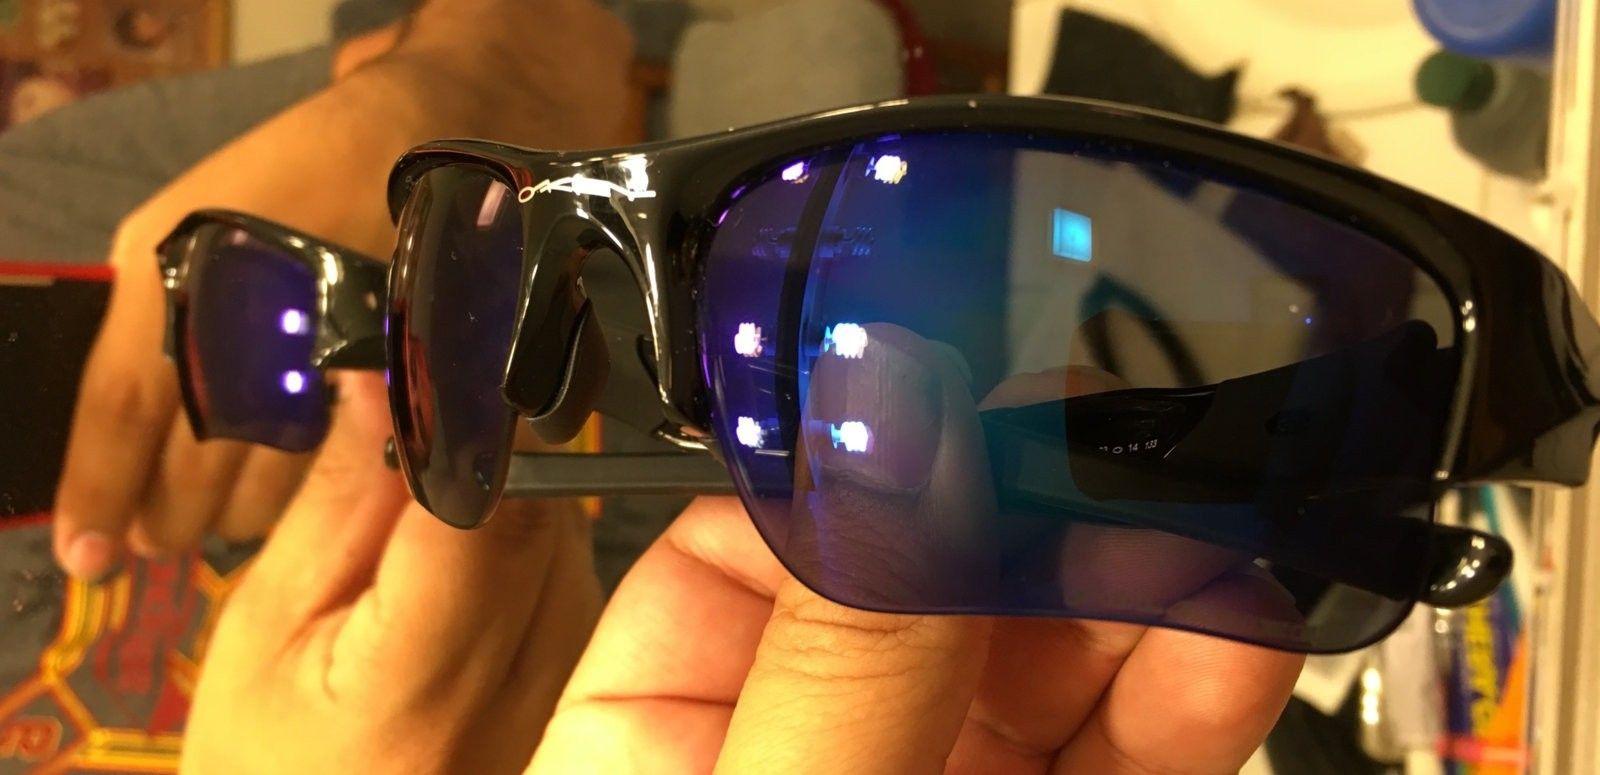 Flak Jacket 1.0 - 2 pairs - Polarized lenses - 2016-07-07 19.23.15.jpg